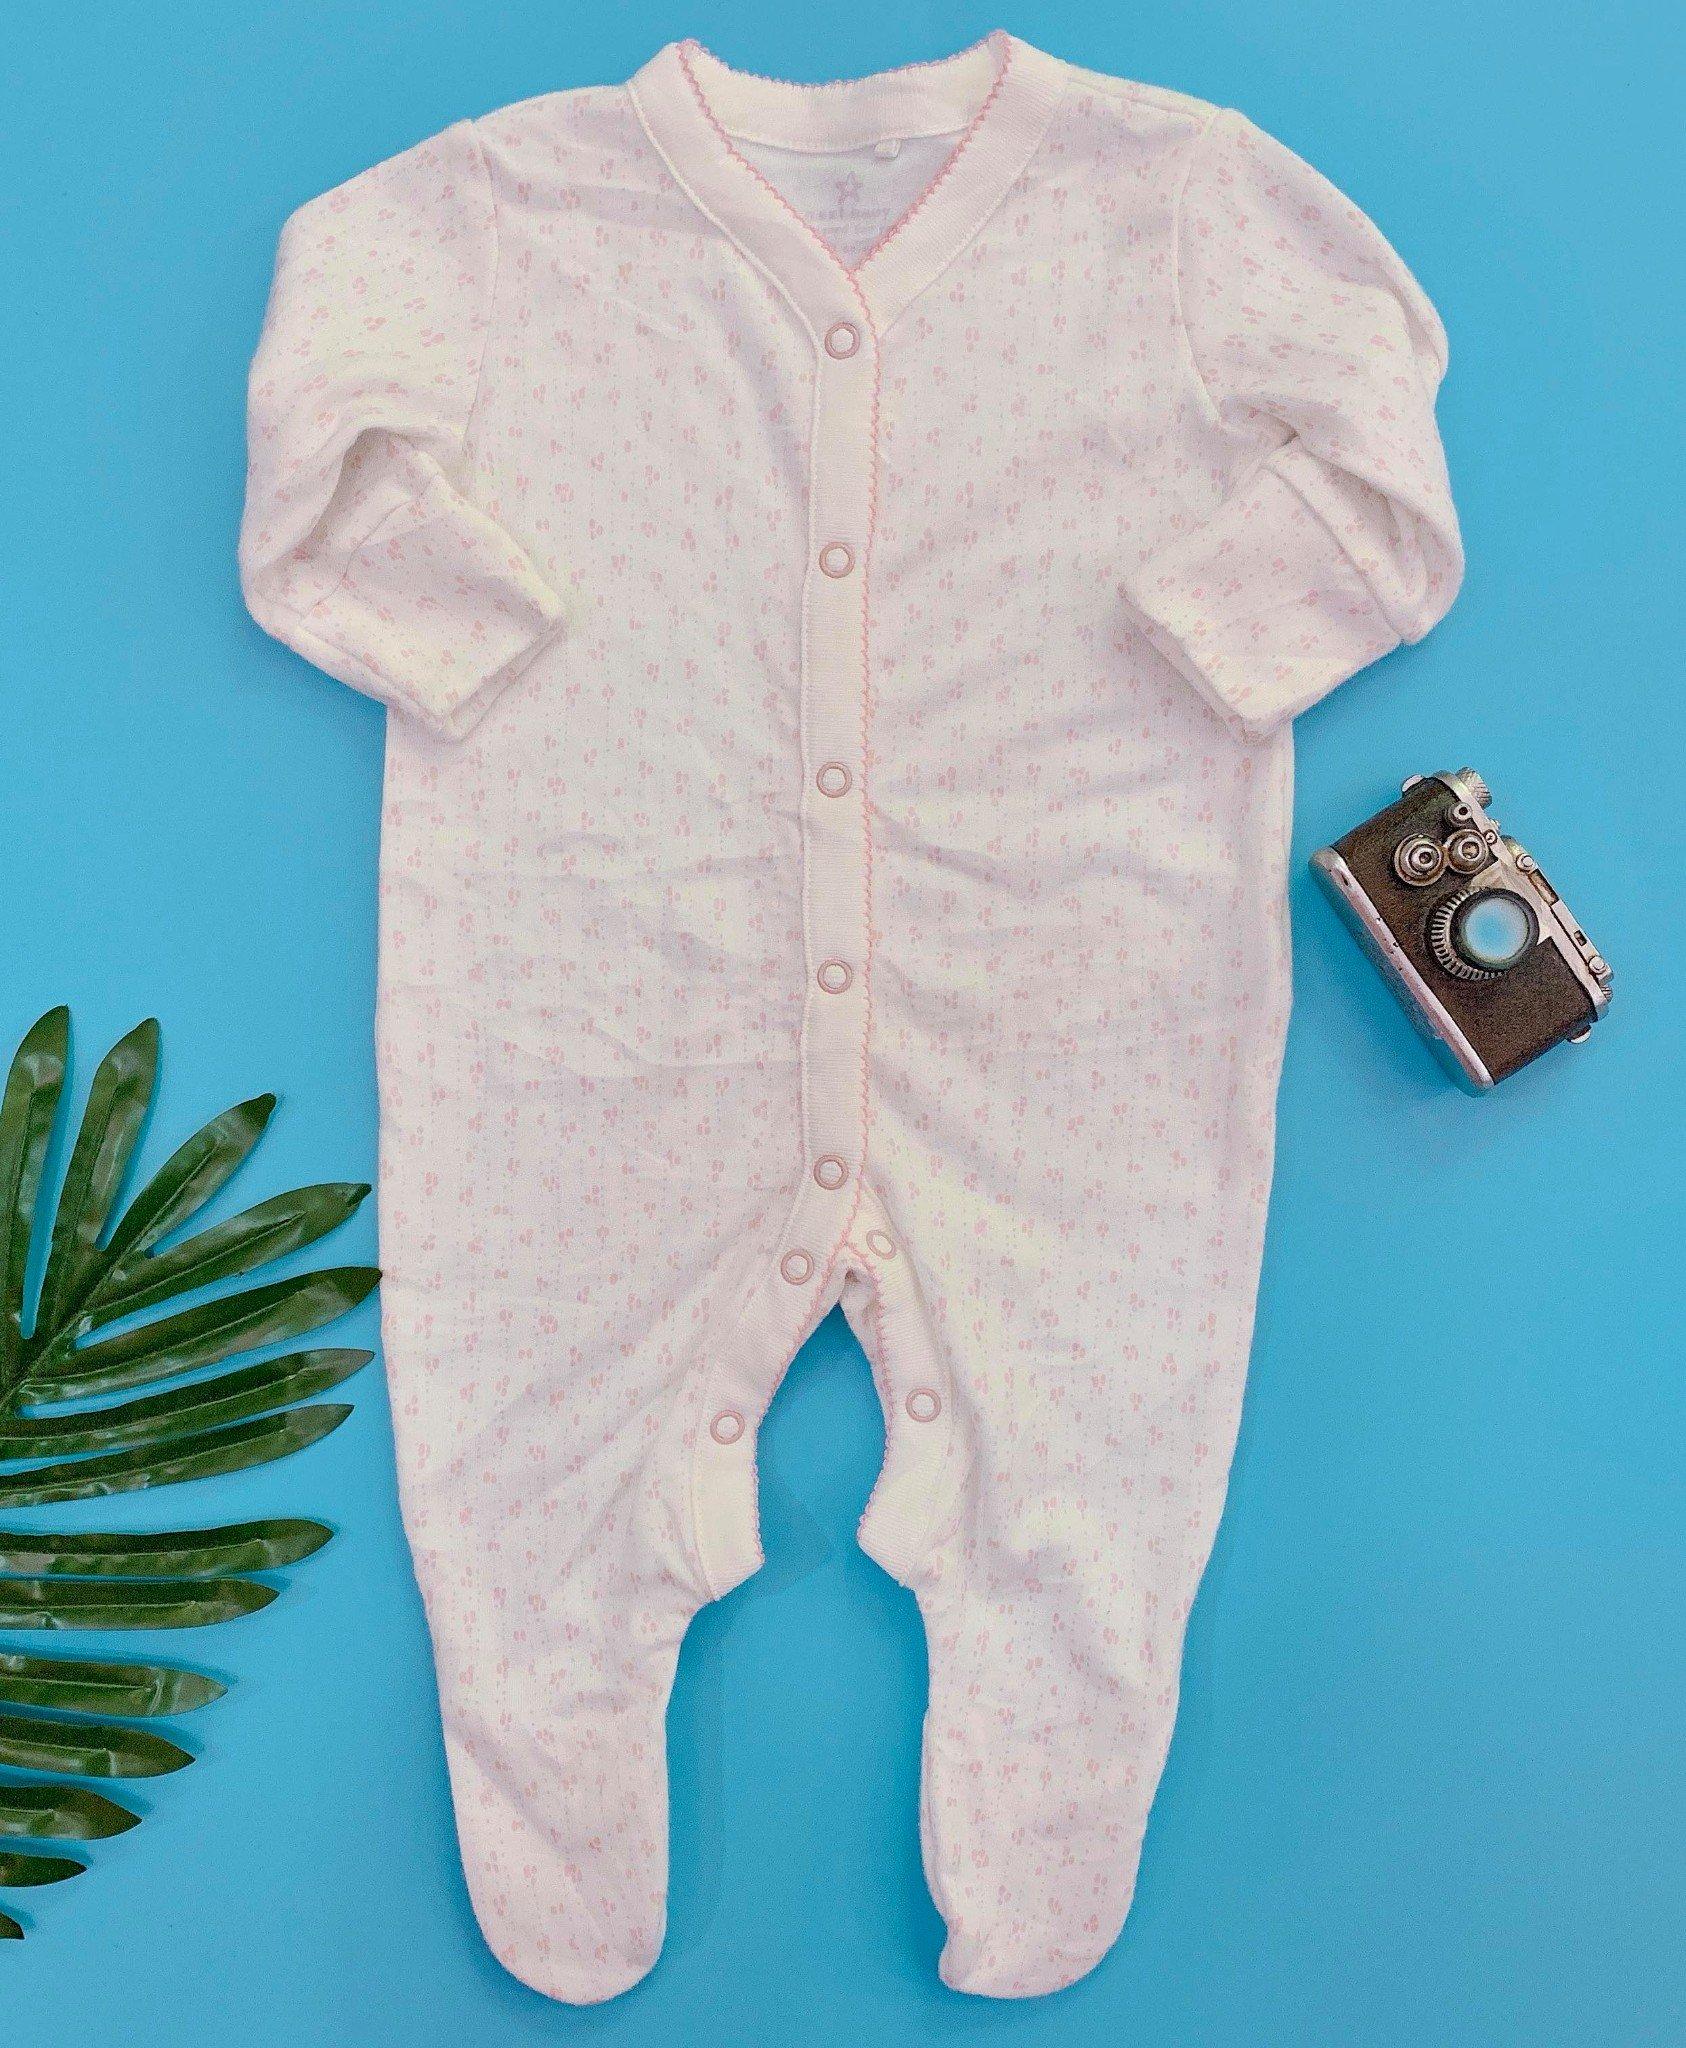 [4-5kg] Sleepsuit Next Baby 73 [Girl] - Trắng/Hoa Hồng Nhỏ